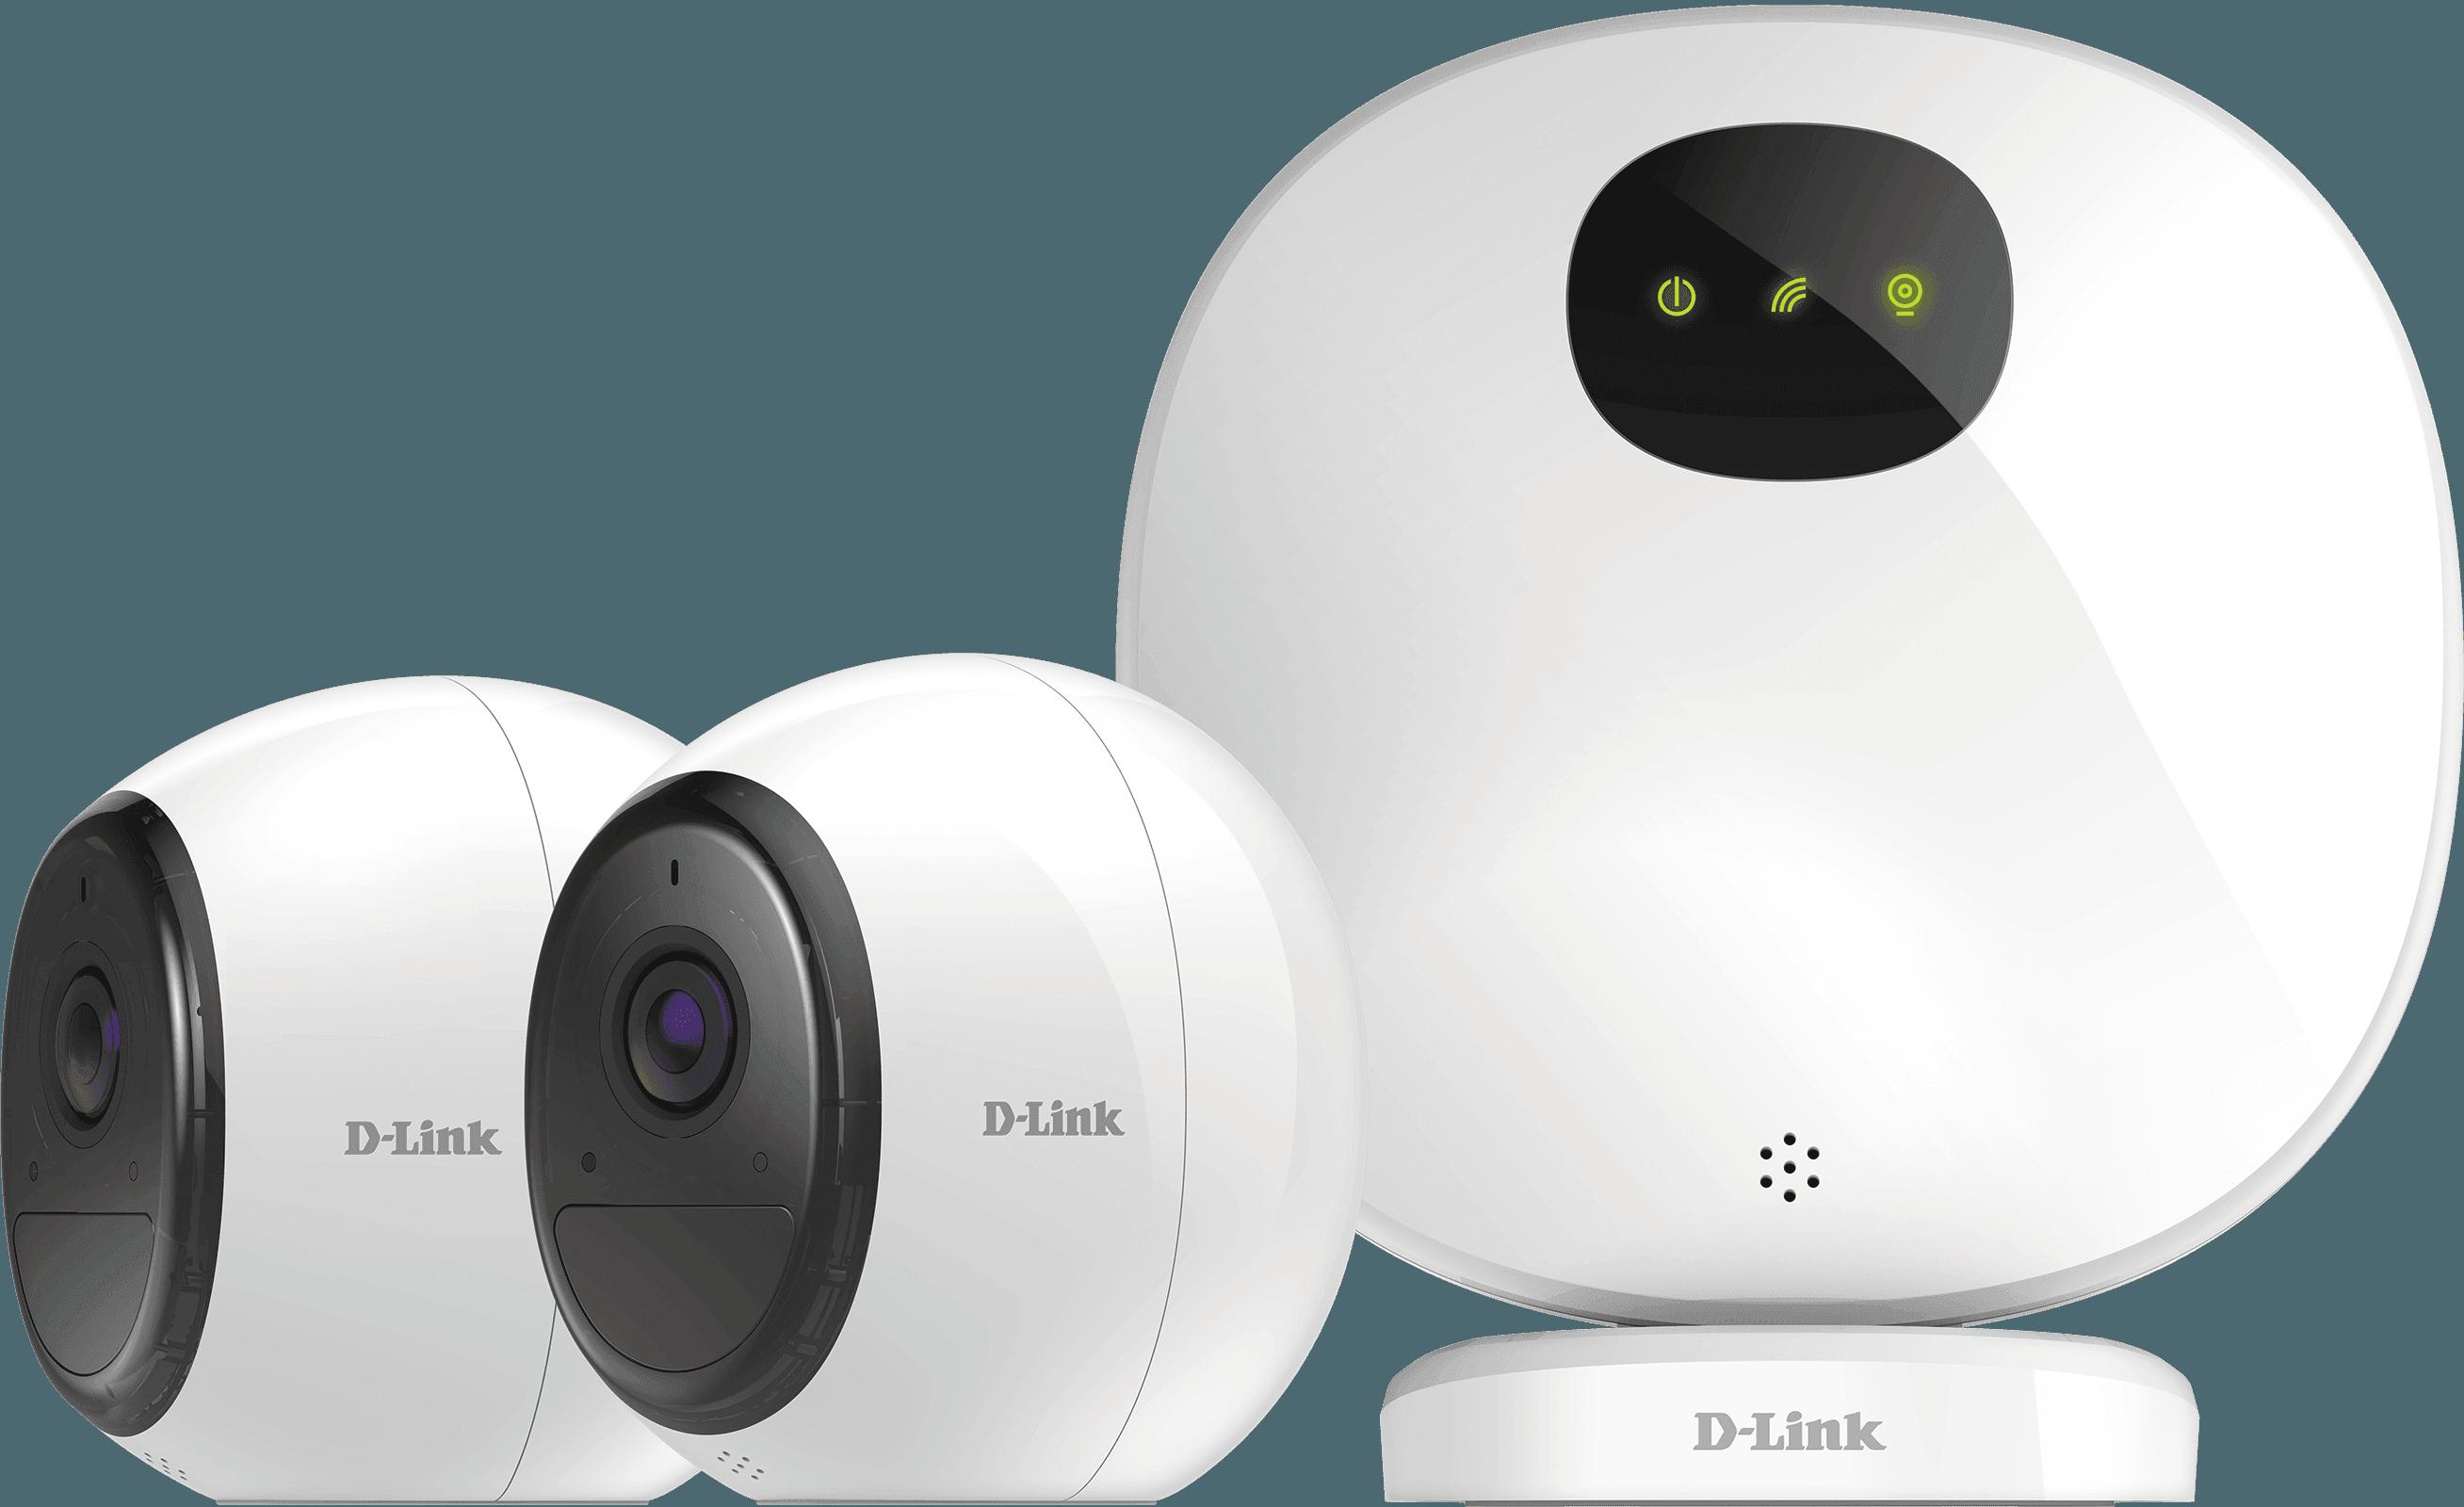 mydlink Pro Wire‑Free Camera Kit (D-LINK DCS-2802KT-EU) Test techboys.de • smarte News, auf den Punkt!